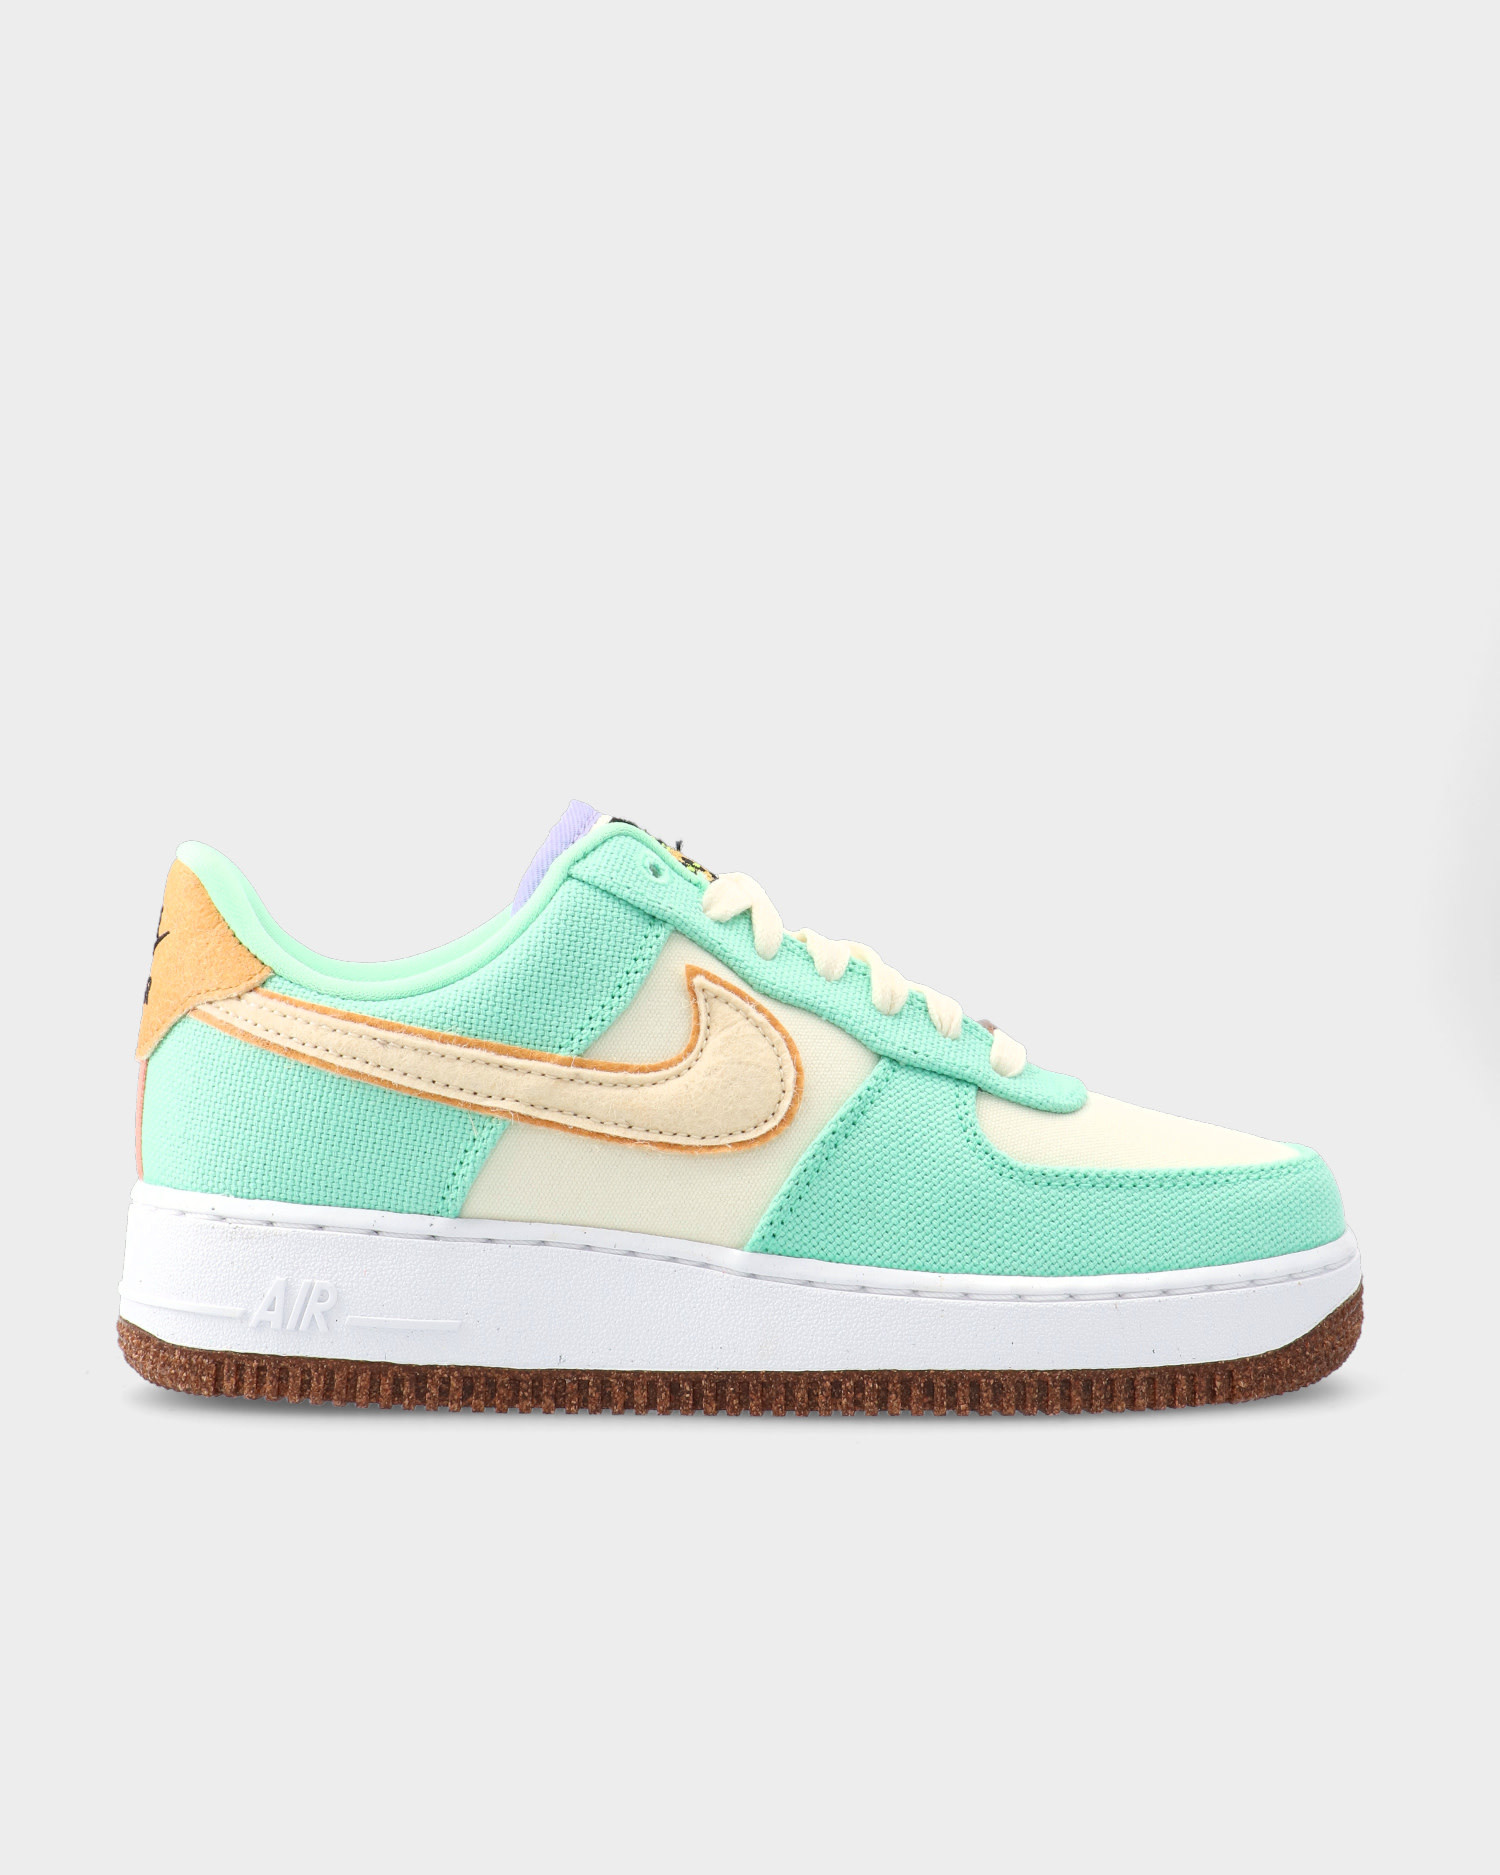 Nike Air Force 1 '07 LX W Green Glow/Coconut Milk-Metallic Gold-